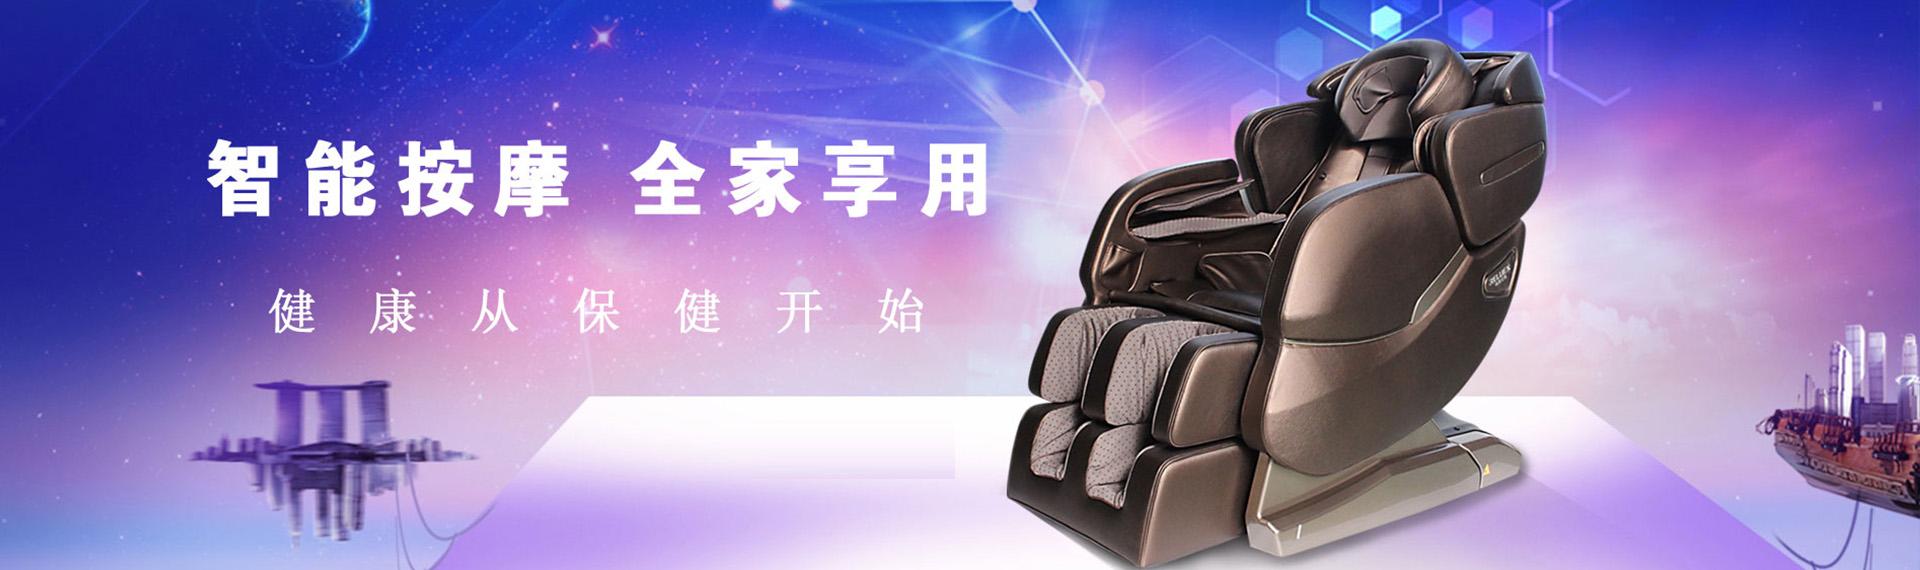 yabo88app保健器材价格